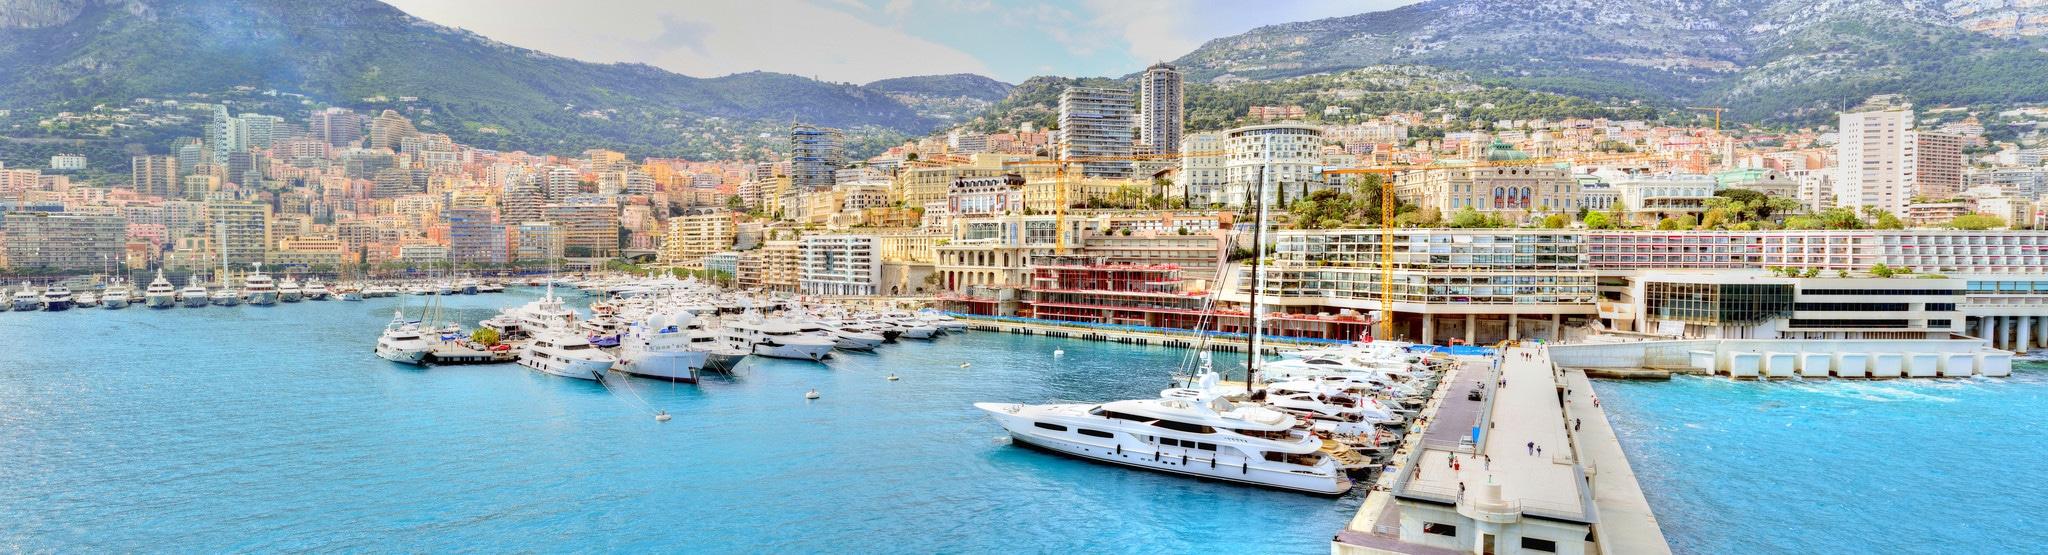 WALKING TOUR Monaco Monte Carlo